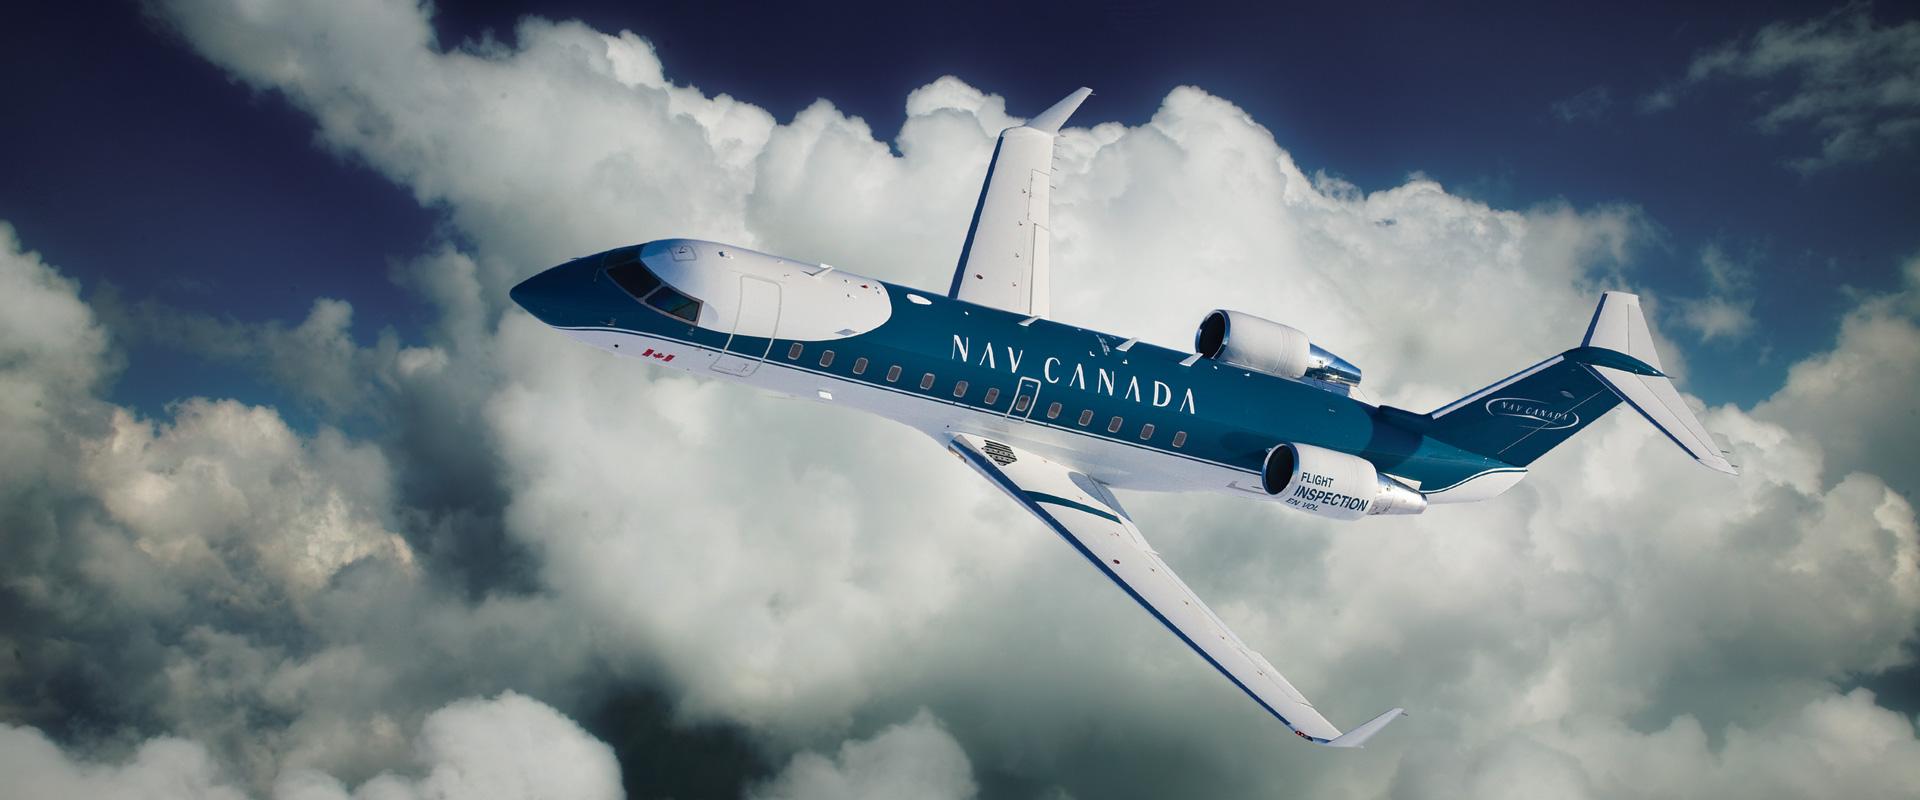 NAV_CANADA plane flying